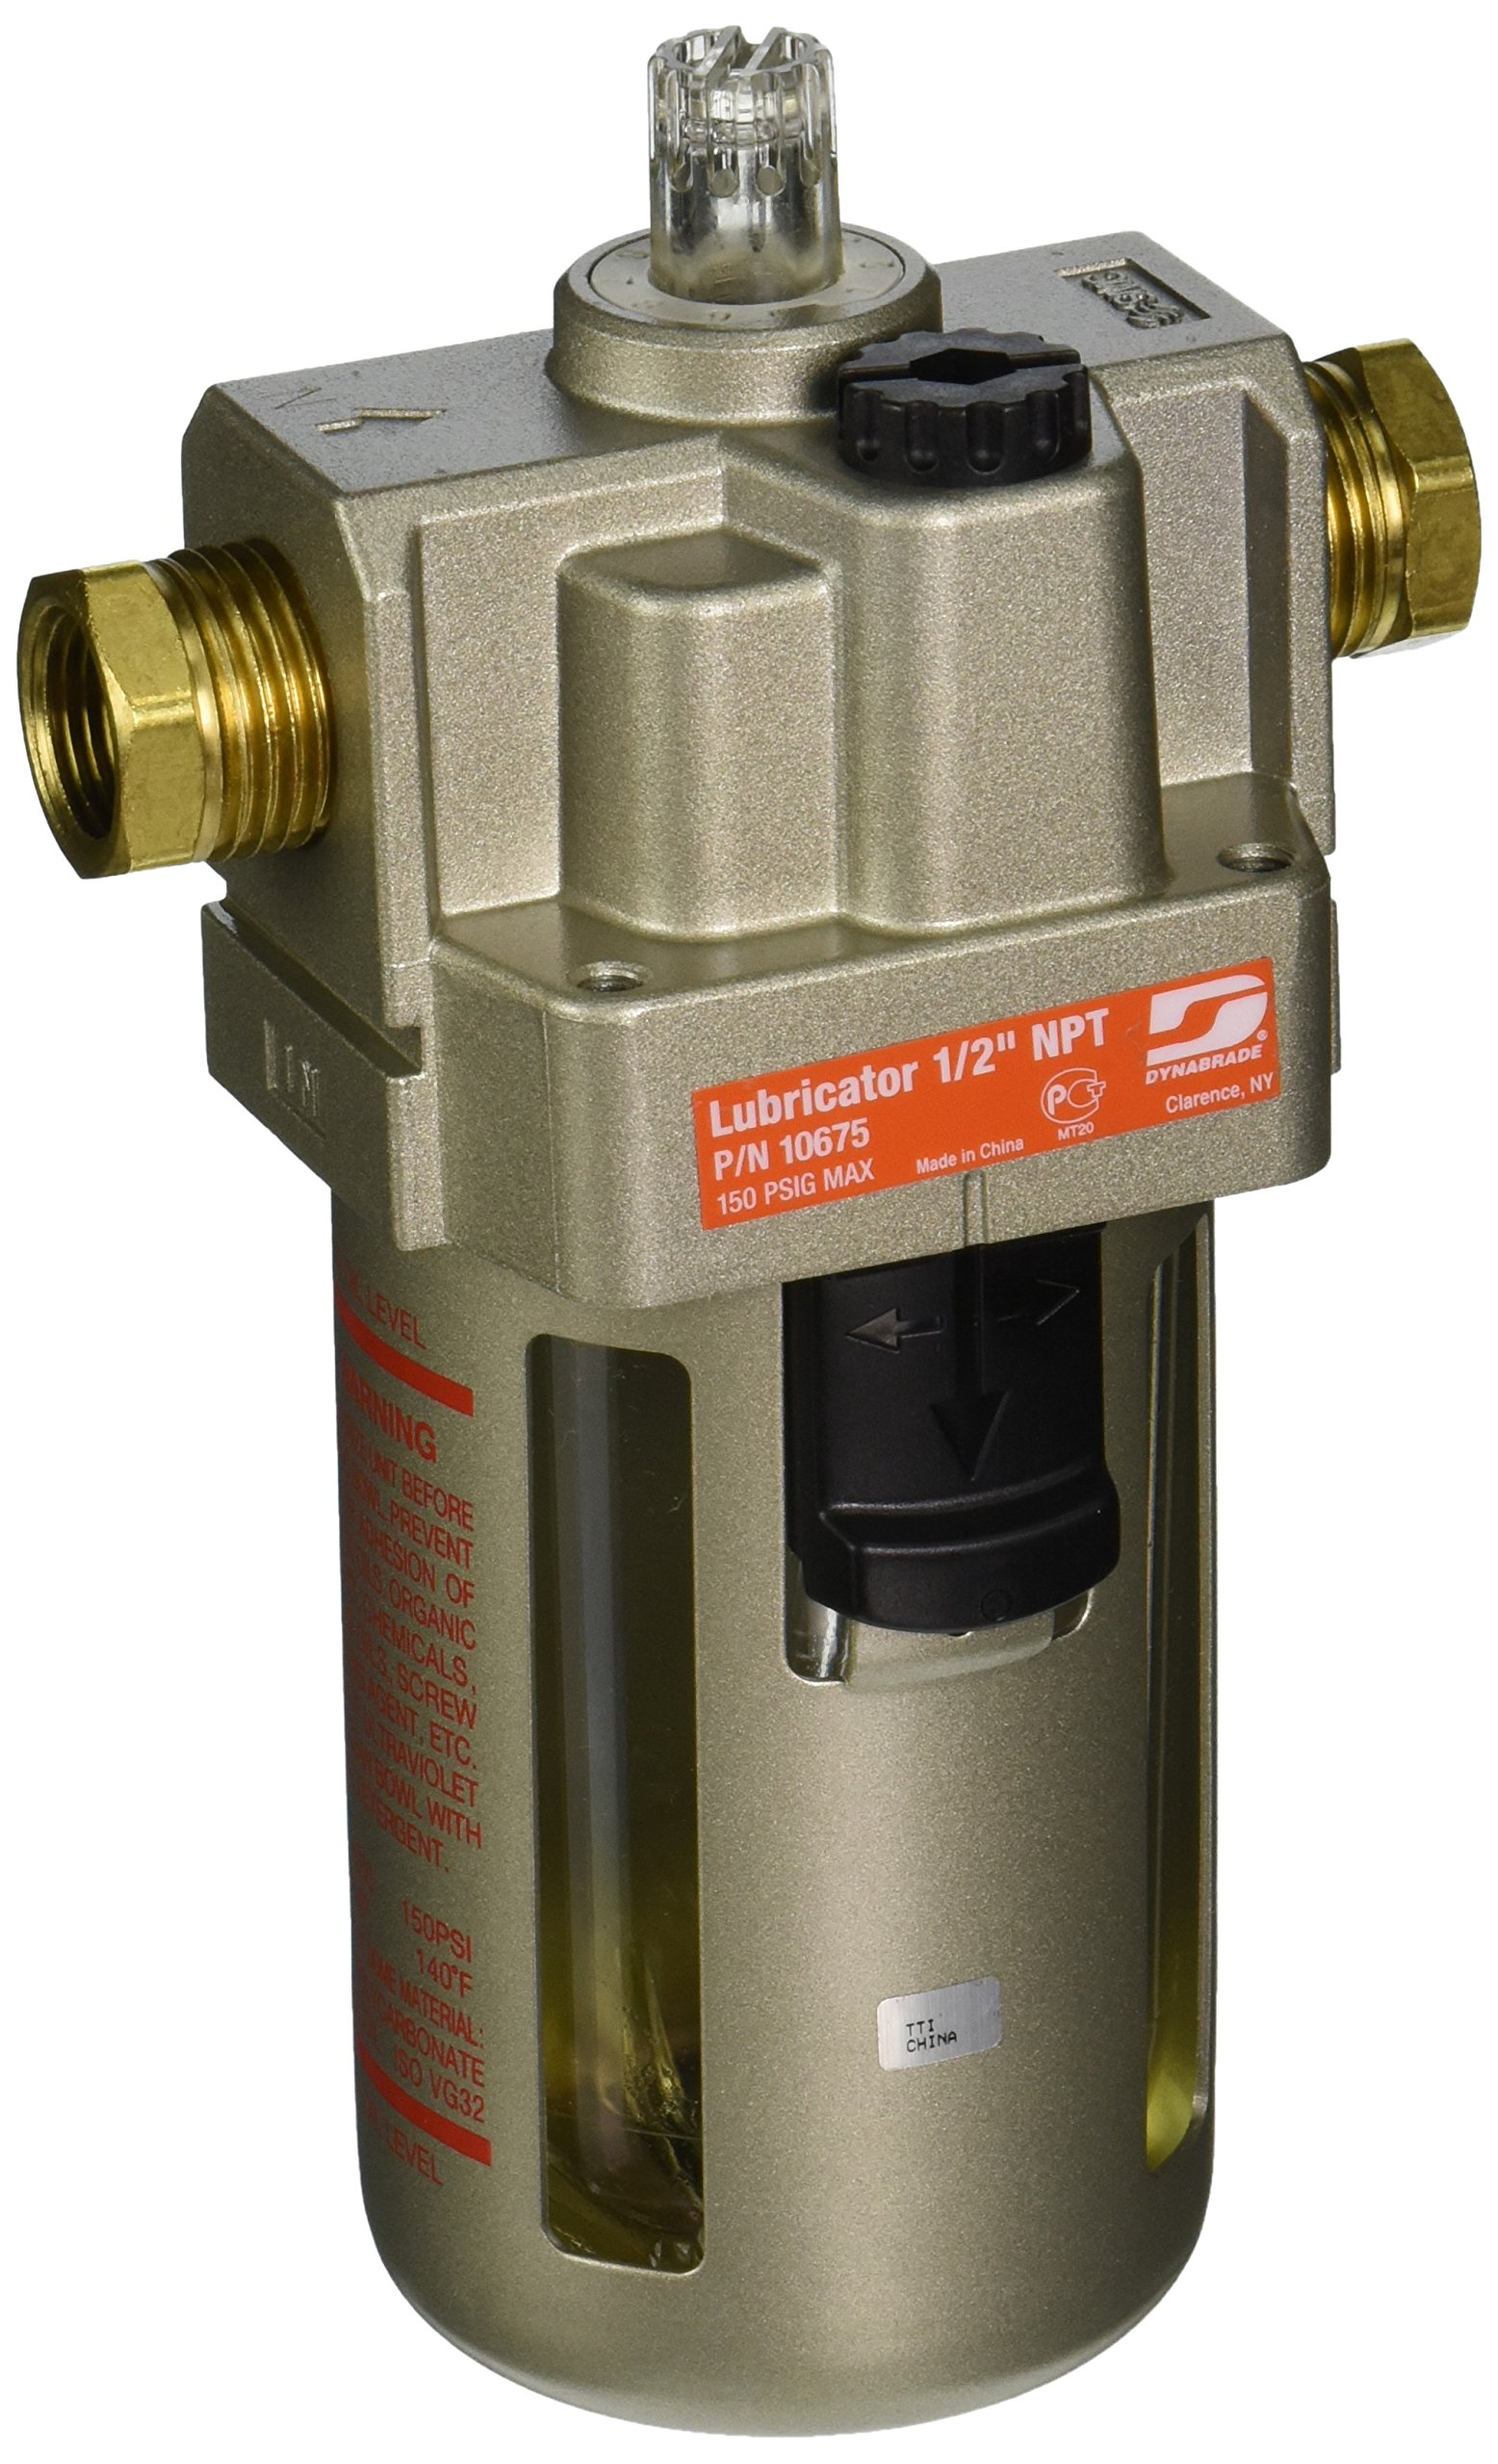 Dynabrade 10675 1/2-Inch  NPT Lubricator